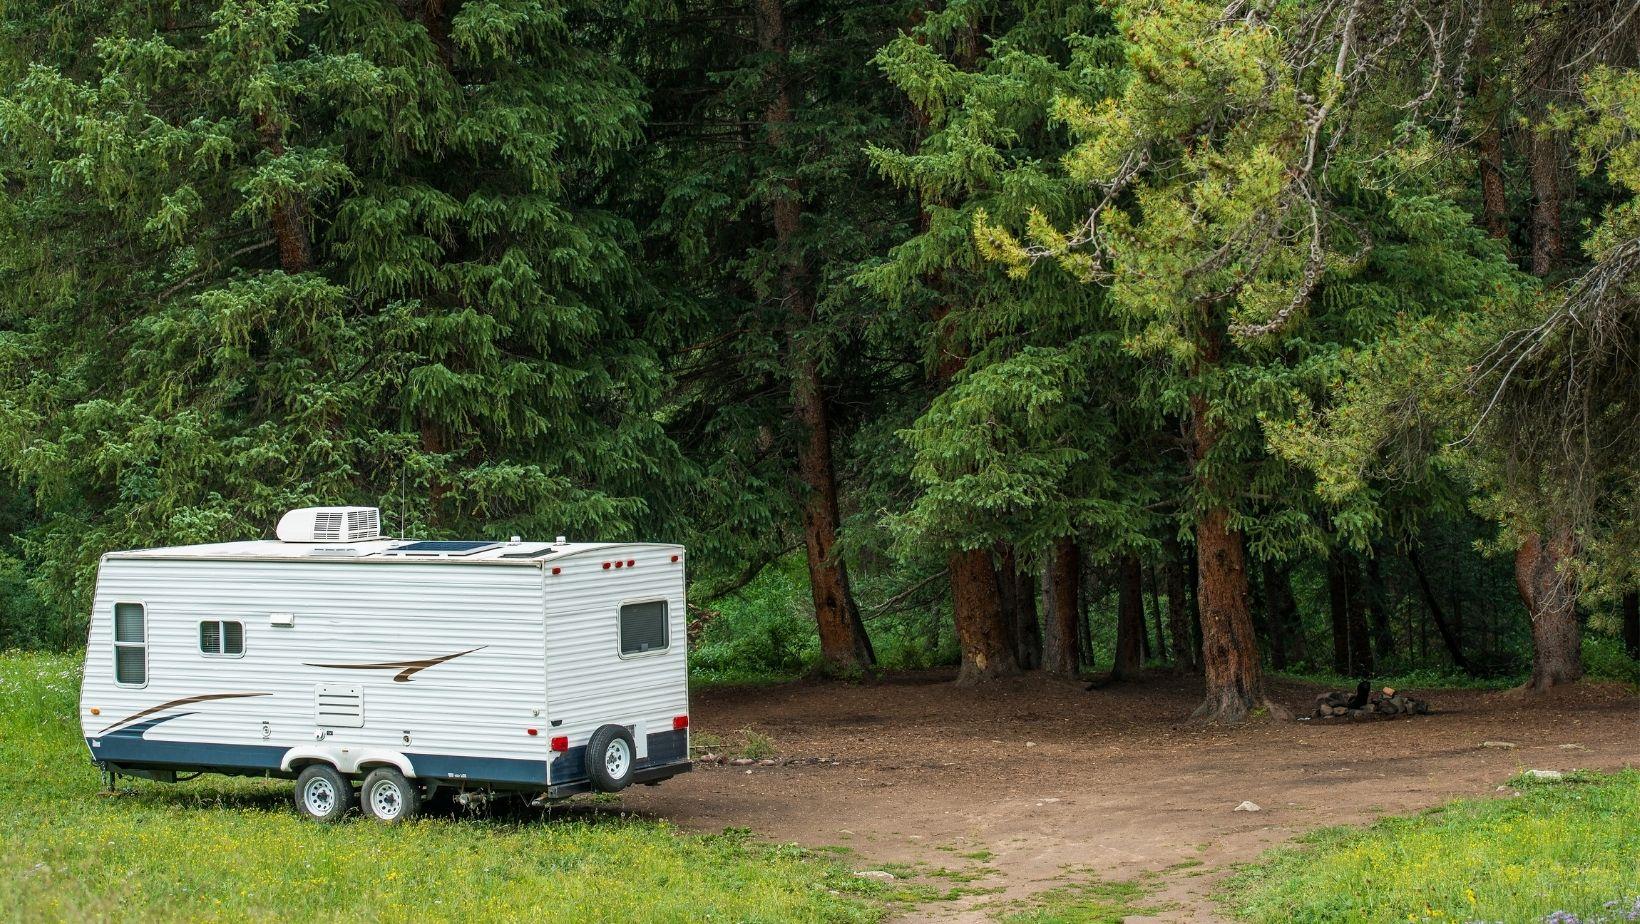 RV trailer boondocking near forest